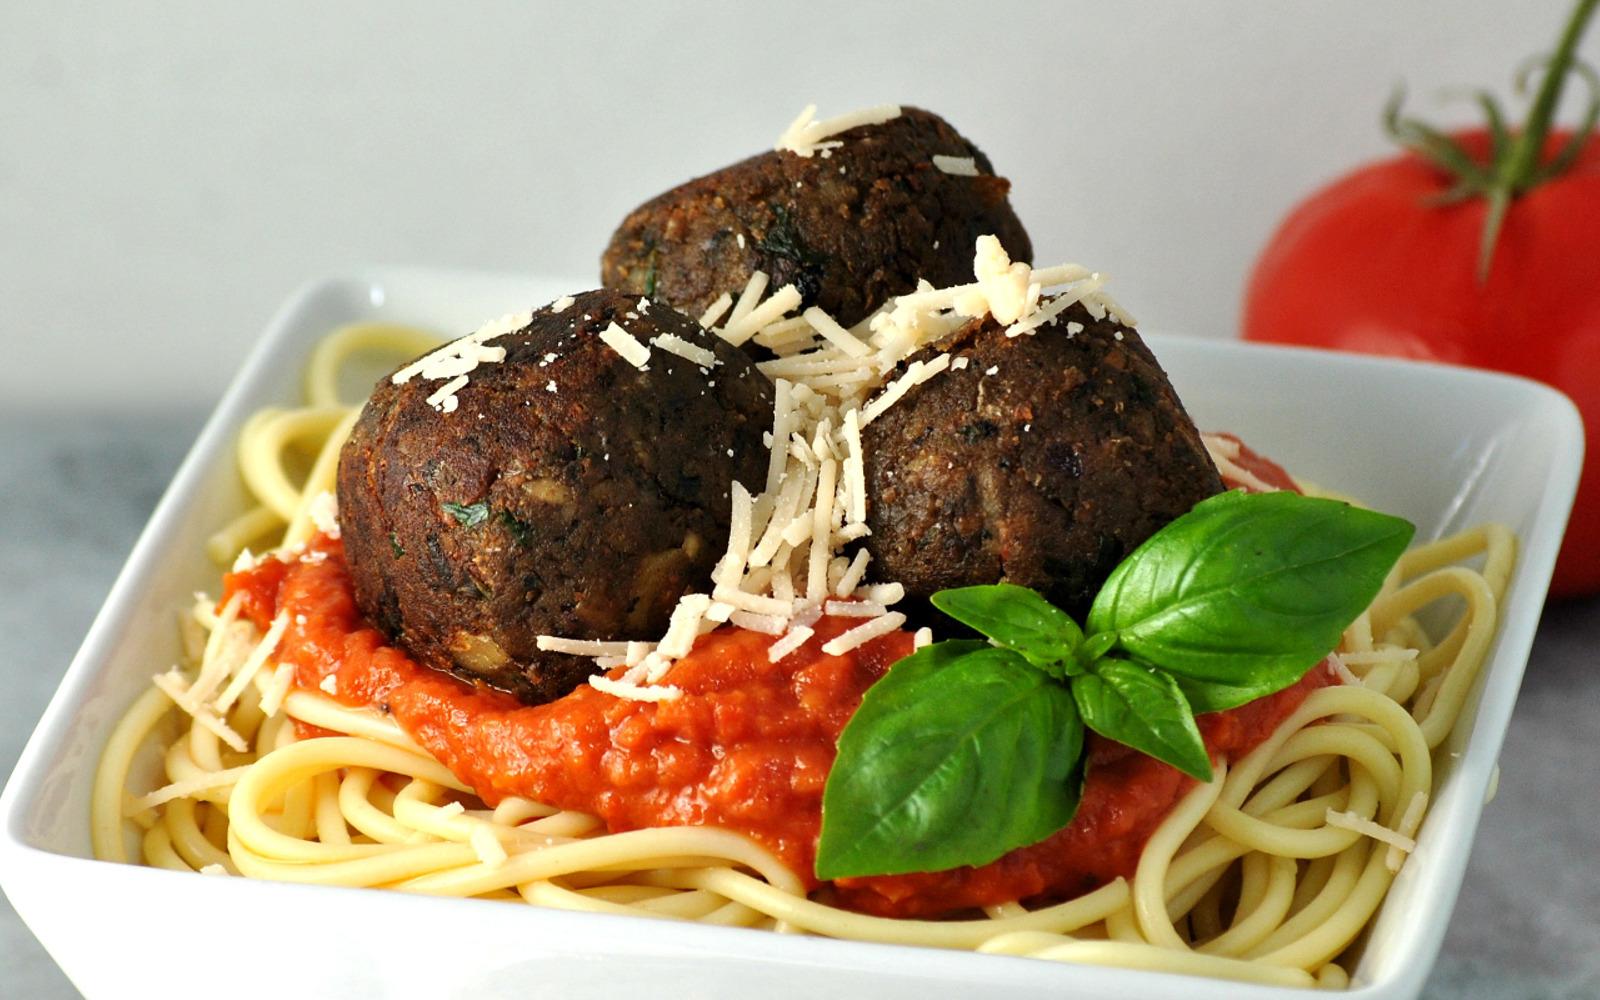 Pesto, Mushroom, and White Bean Meatballs